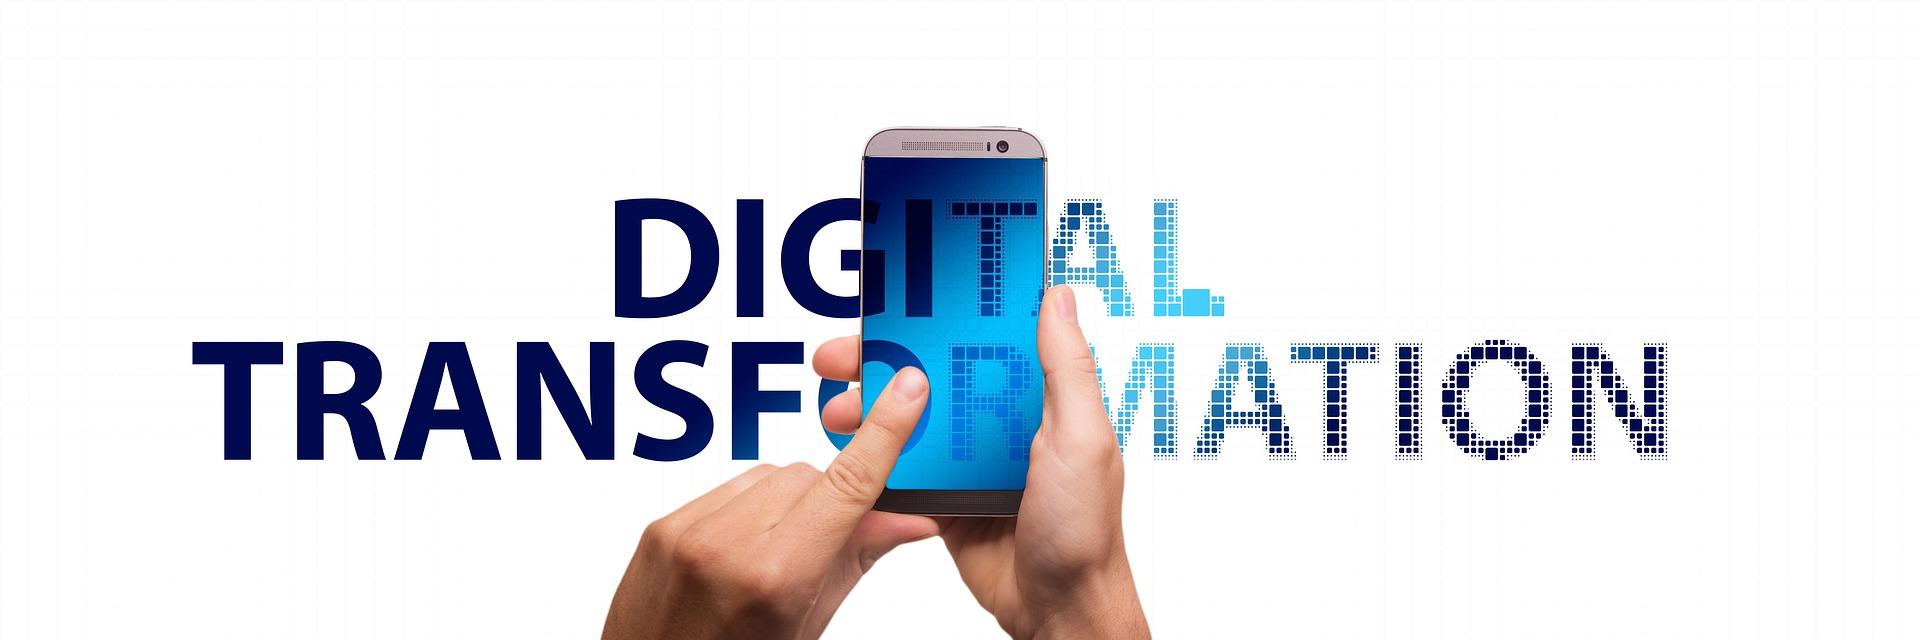 Digital transformation: Comprehensive guide to digital business transformation